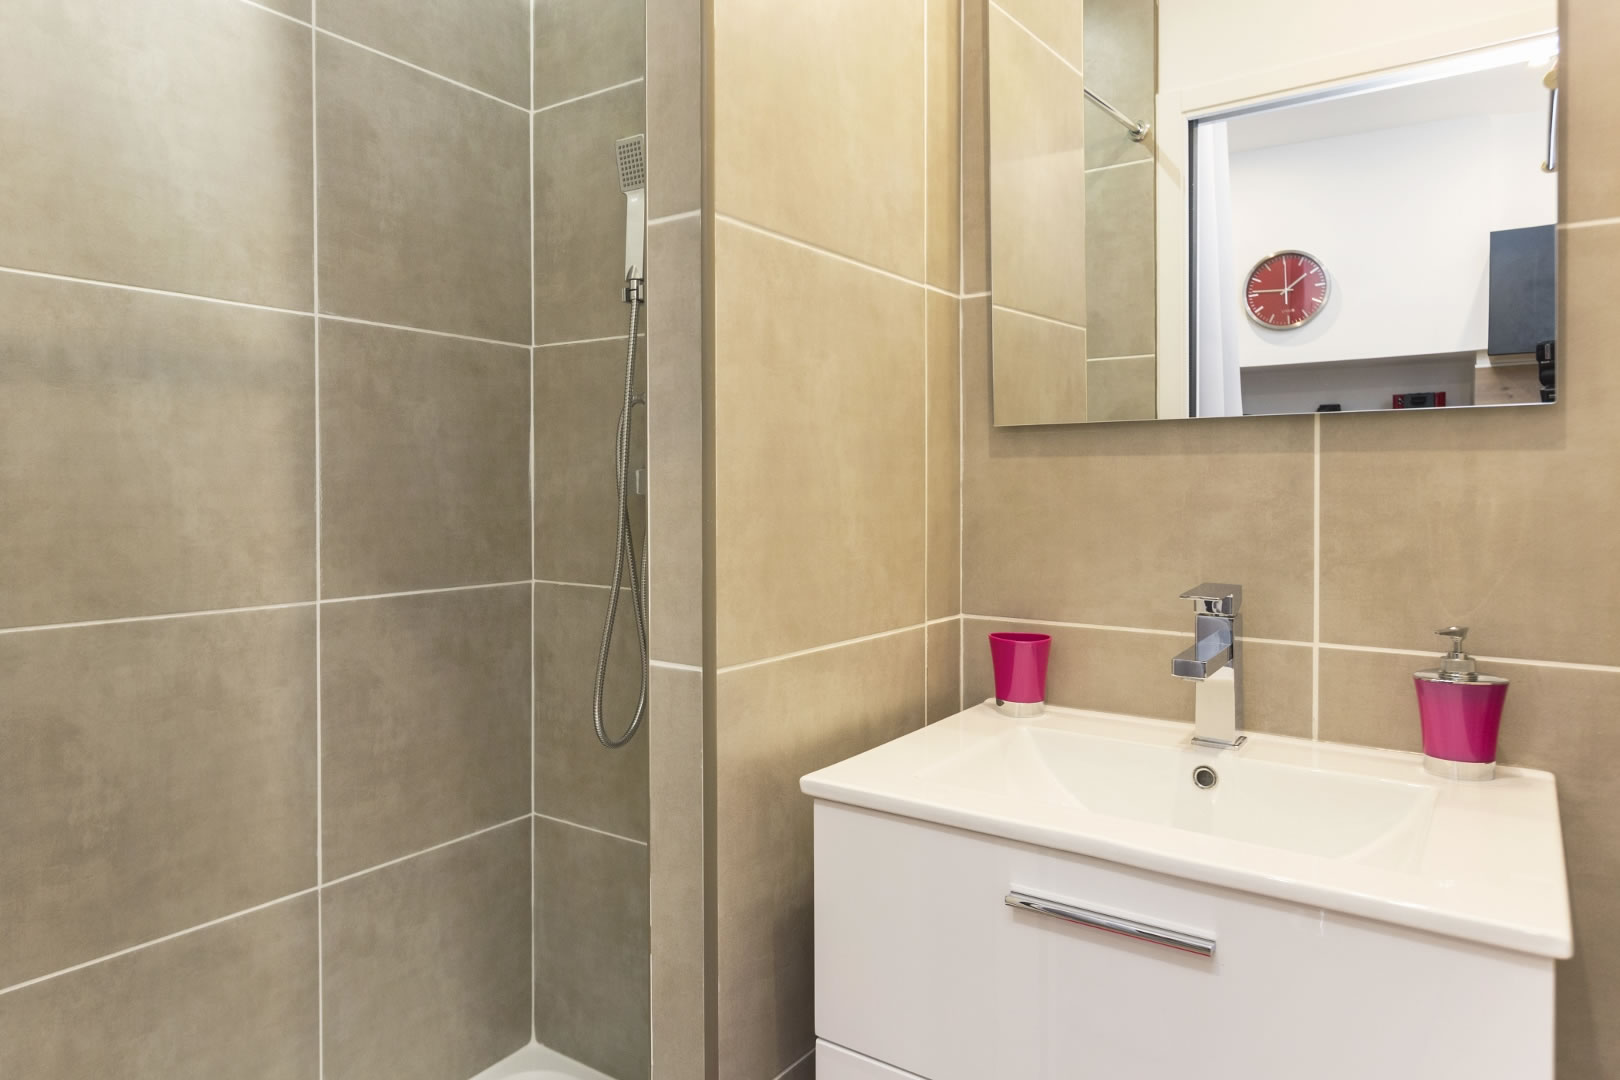 Chambre spa 2 places avignon baln o chambre romantique - Chambre avec jacuzzi privatif gard ...